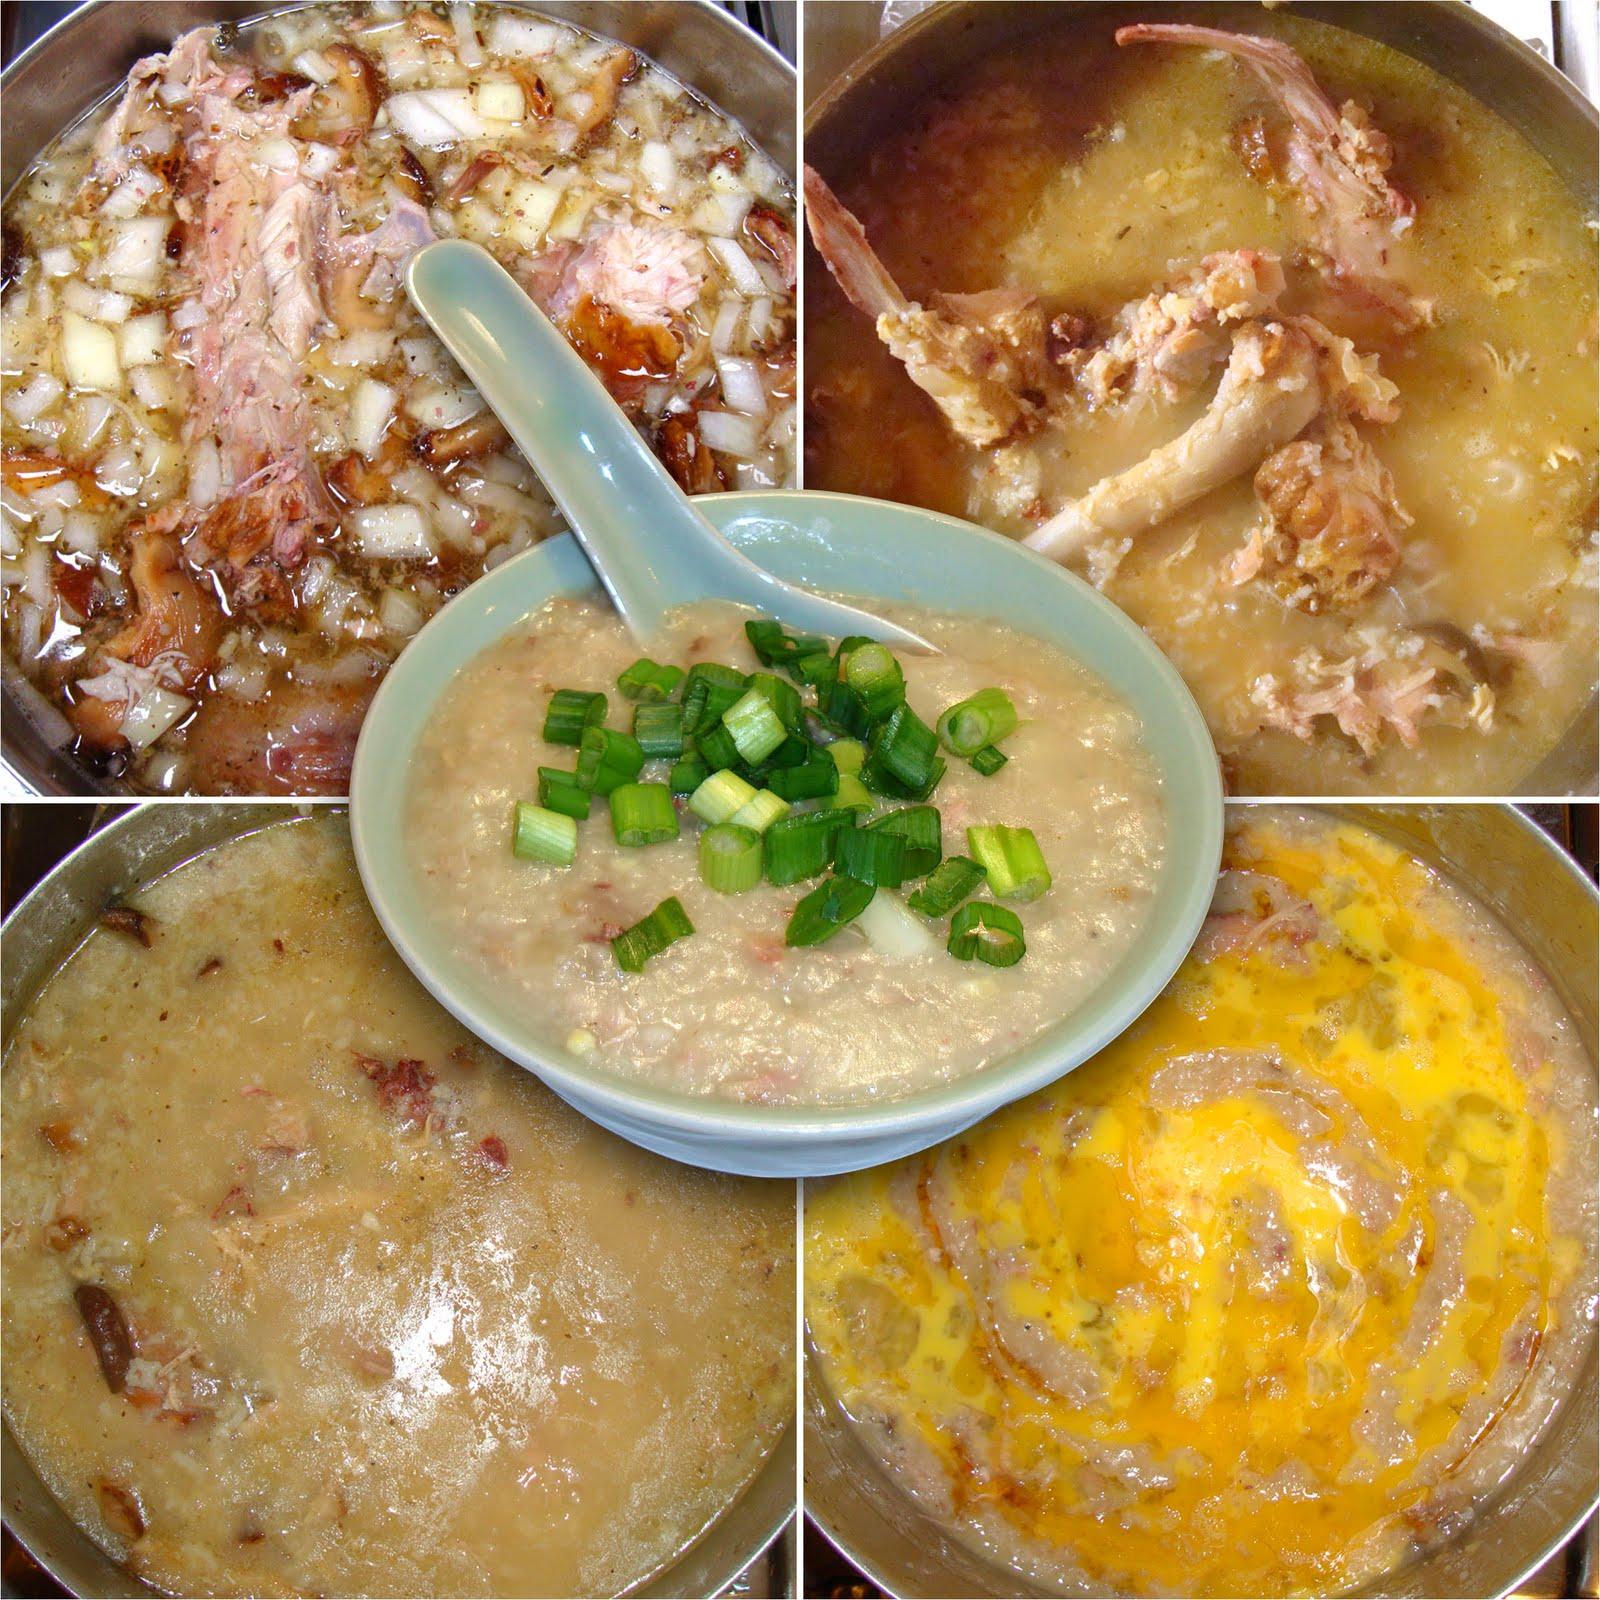 BBQDad1: Turkey Jook or Congee (Chinese)